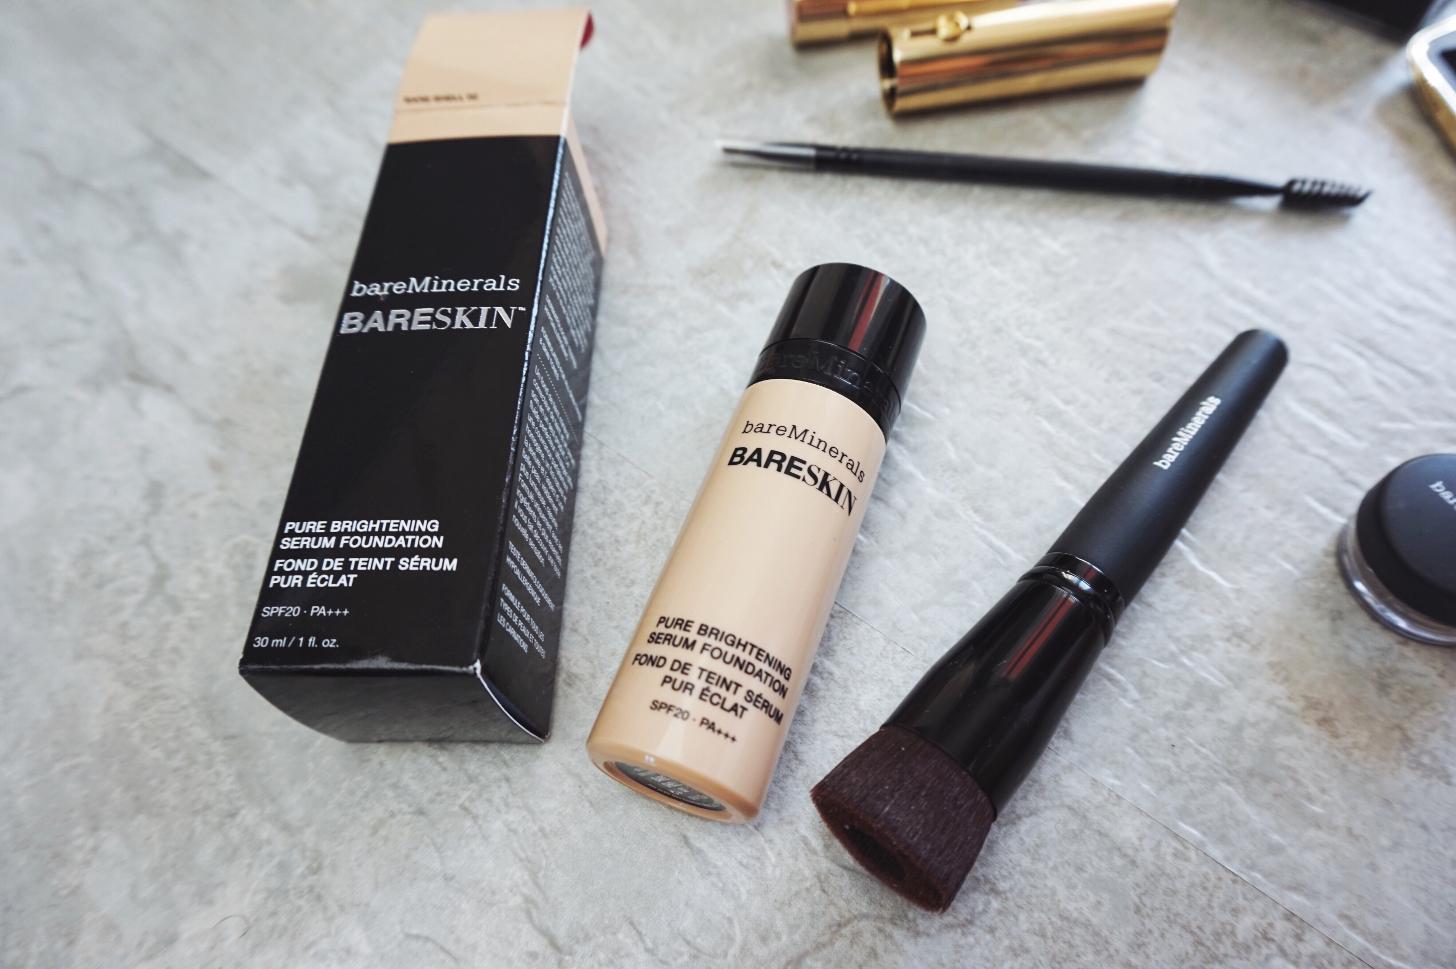 bareminerals_bareskin_beauty_beautyblogger